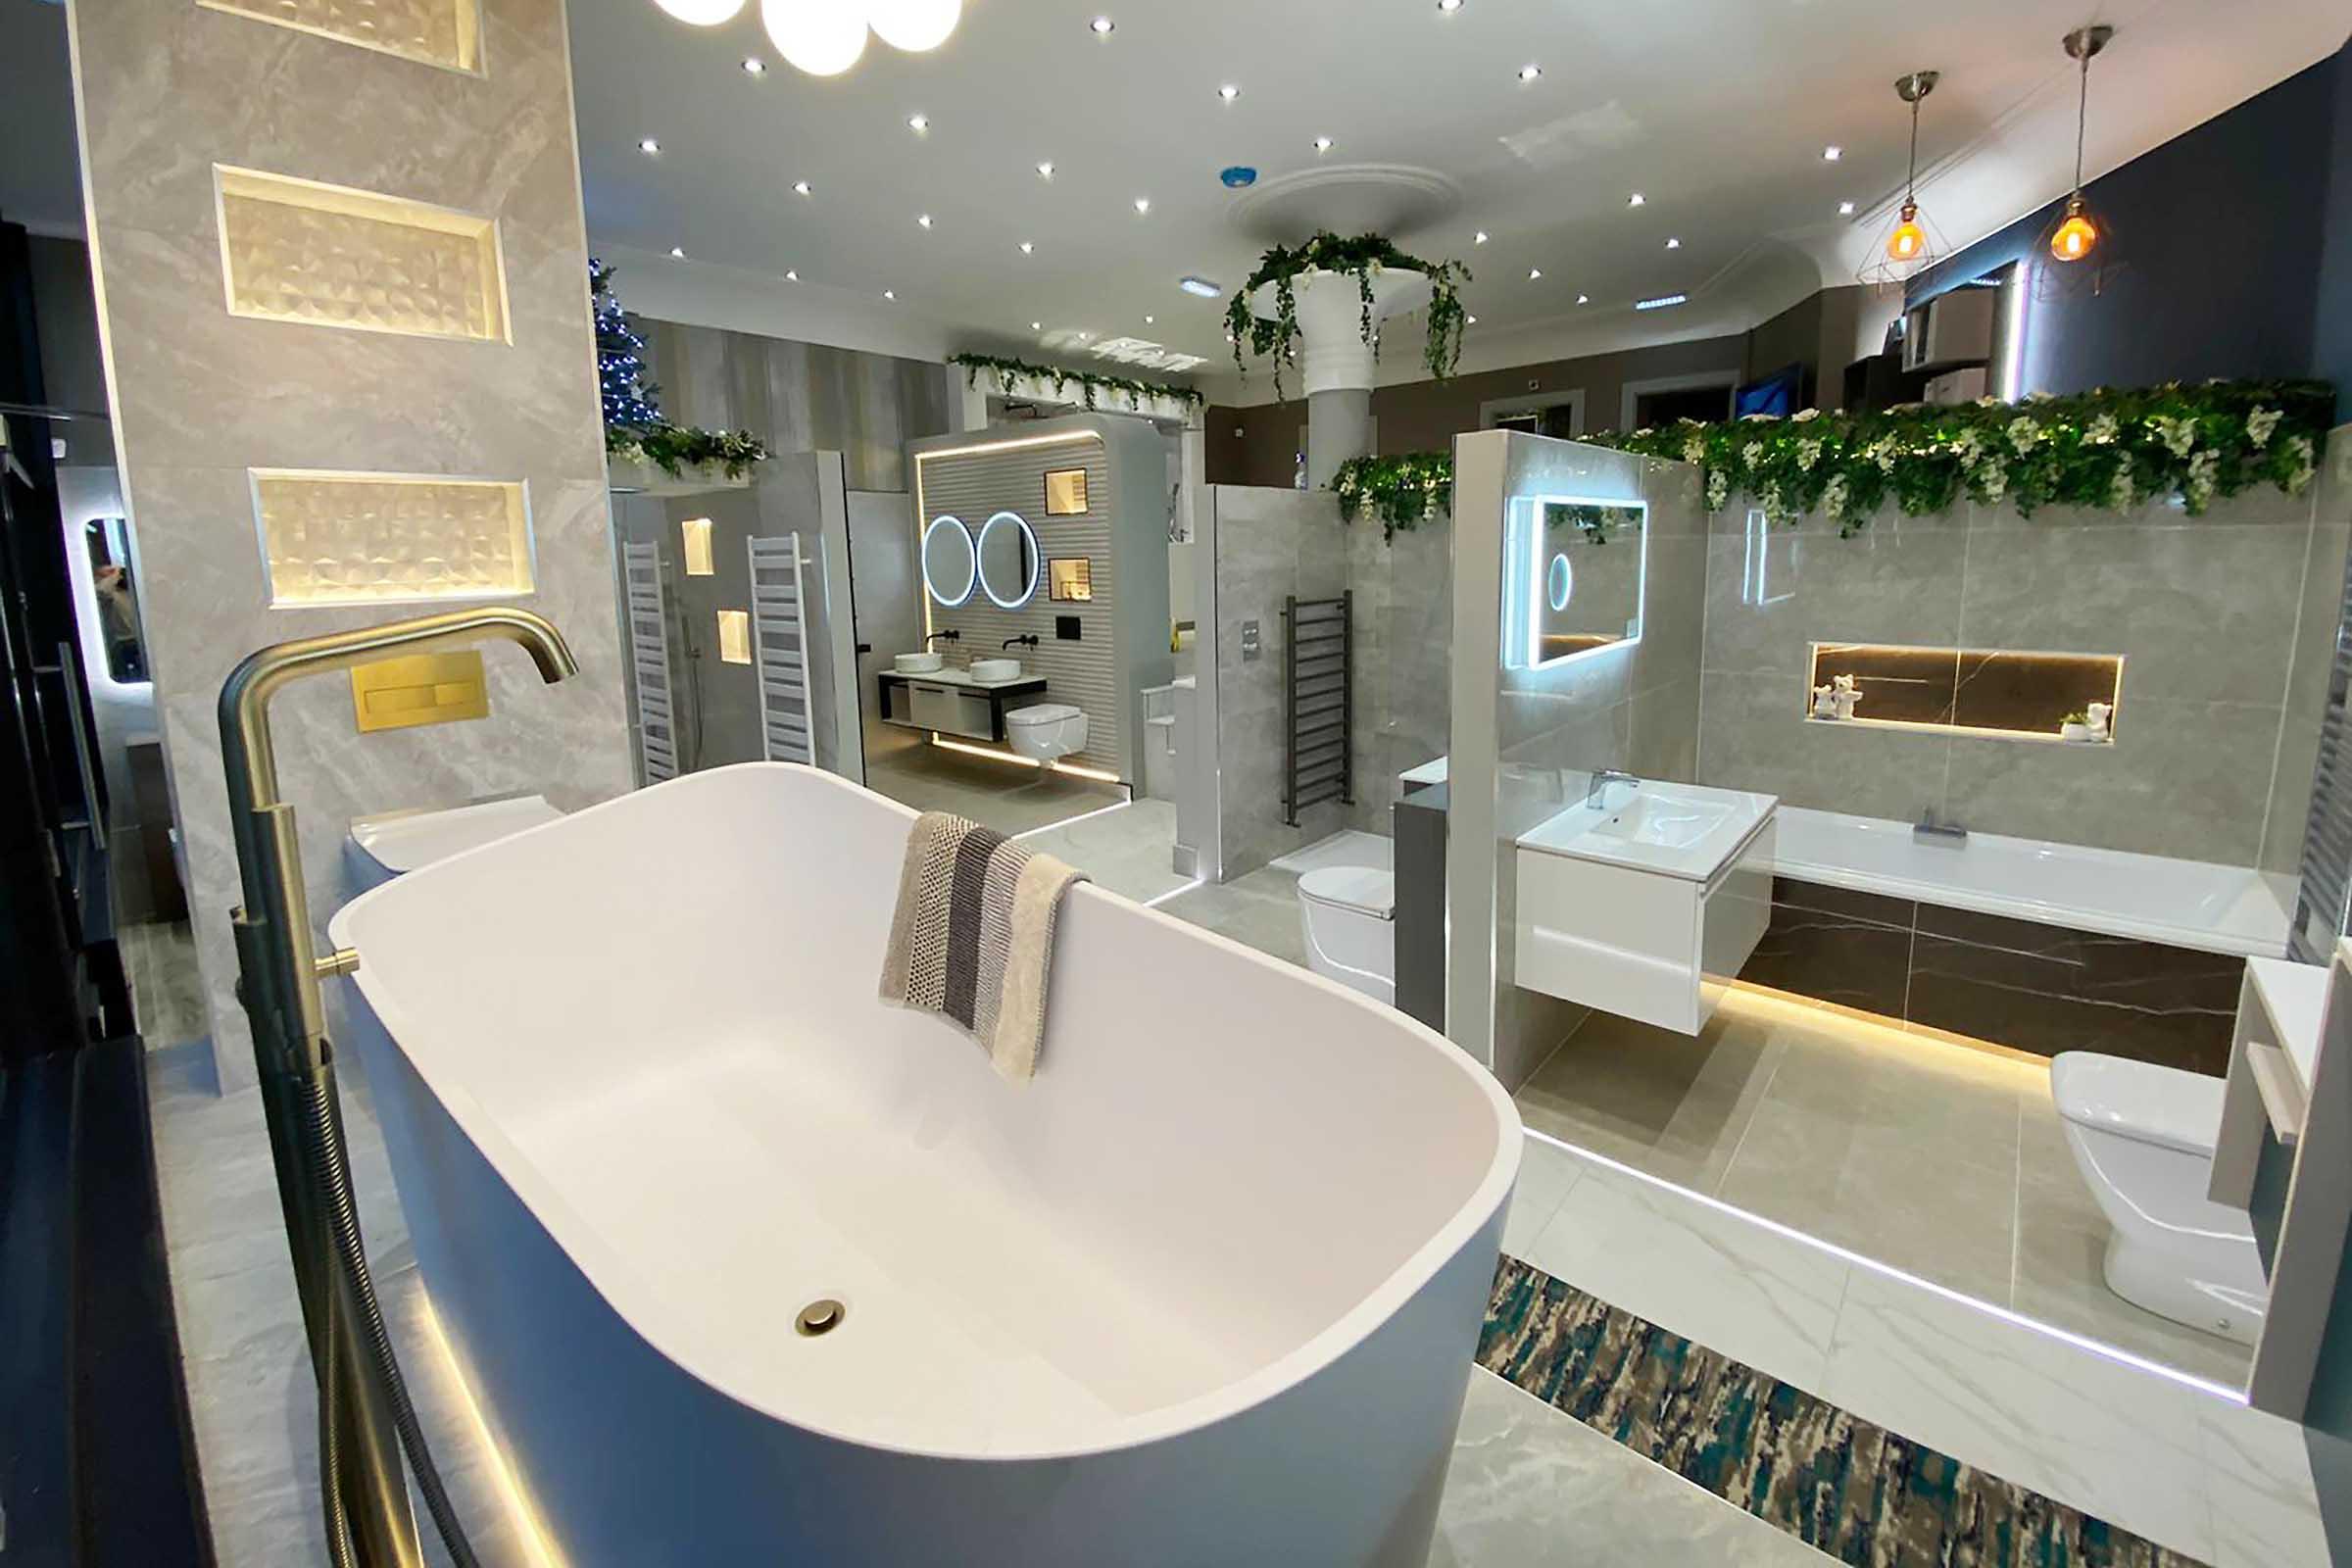 Alec & Trish's Bathroom - December 2020